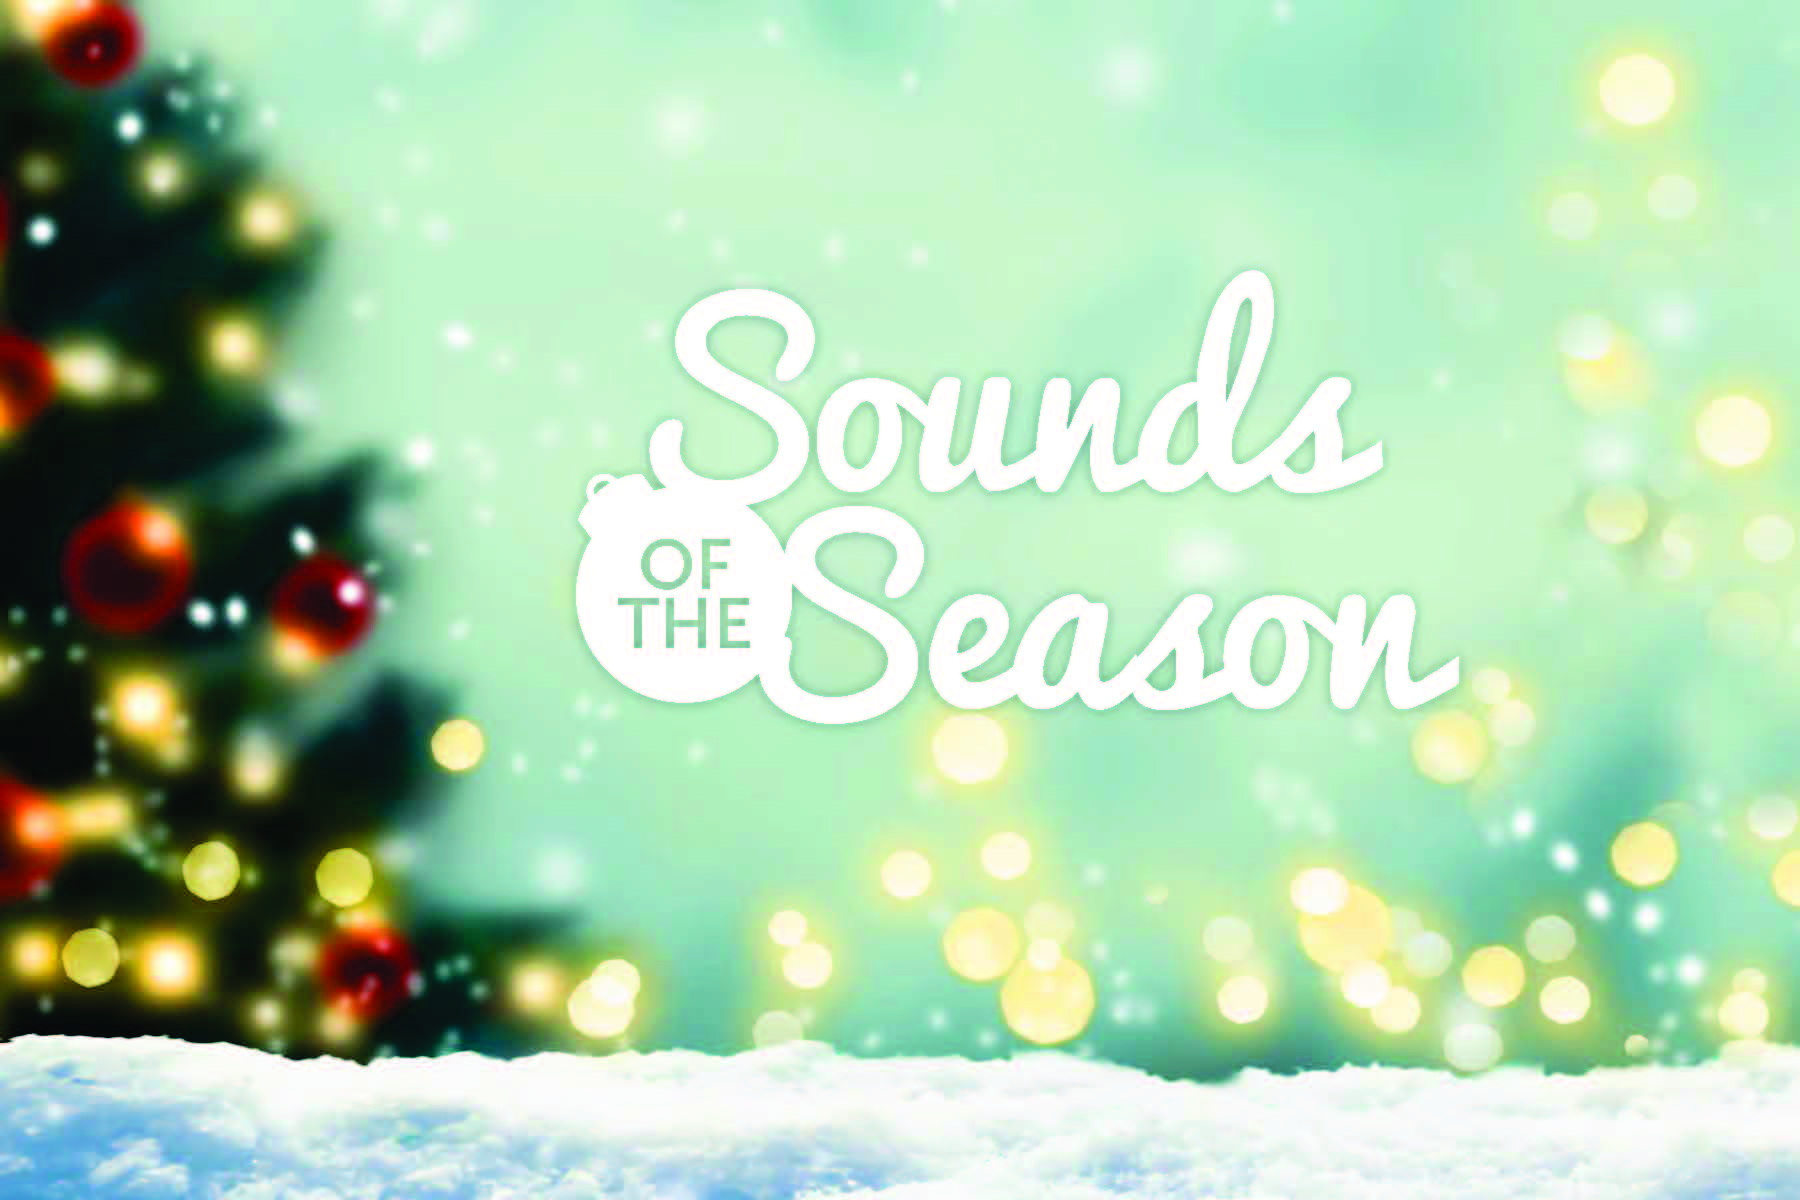 Sounds of the Season | December 8, 2017 | 7:30 P.M. | Brock Recital Hall, Samford University